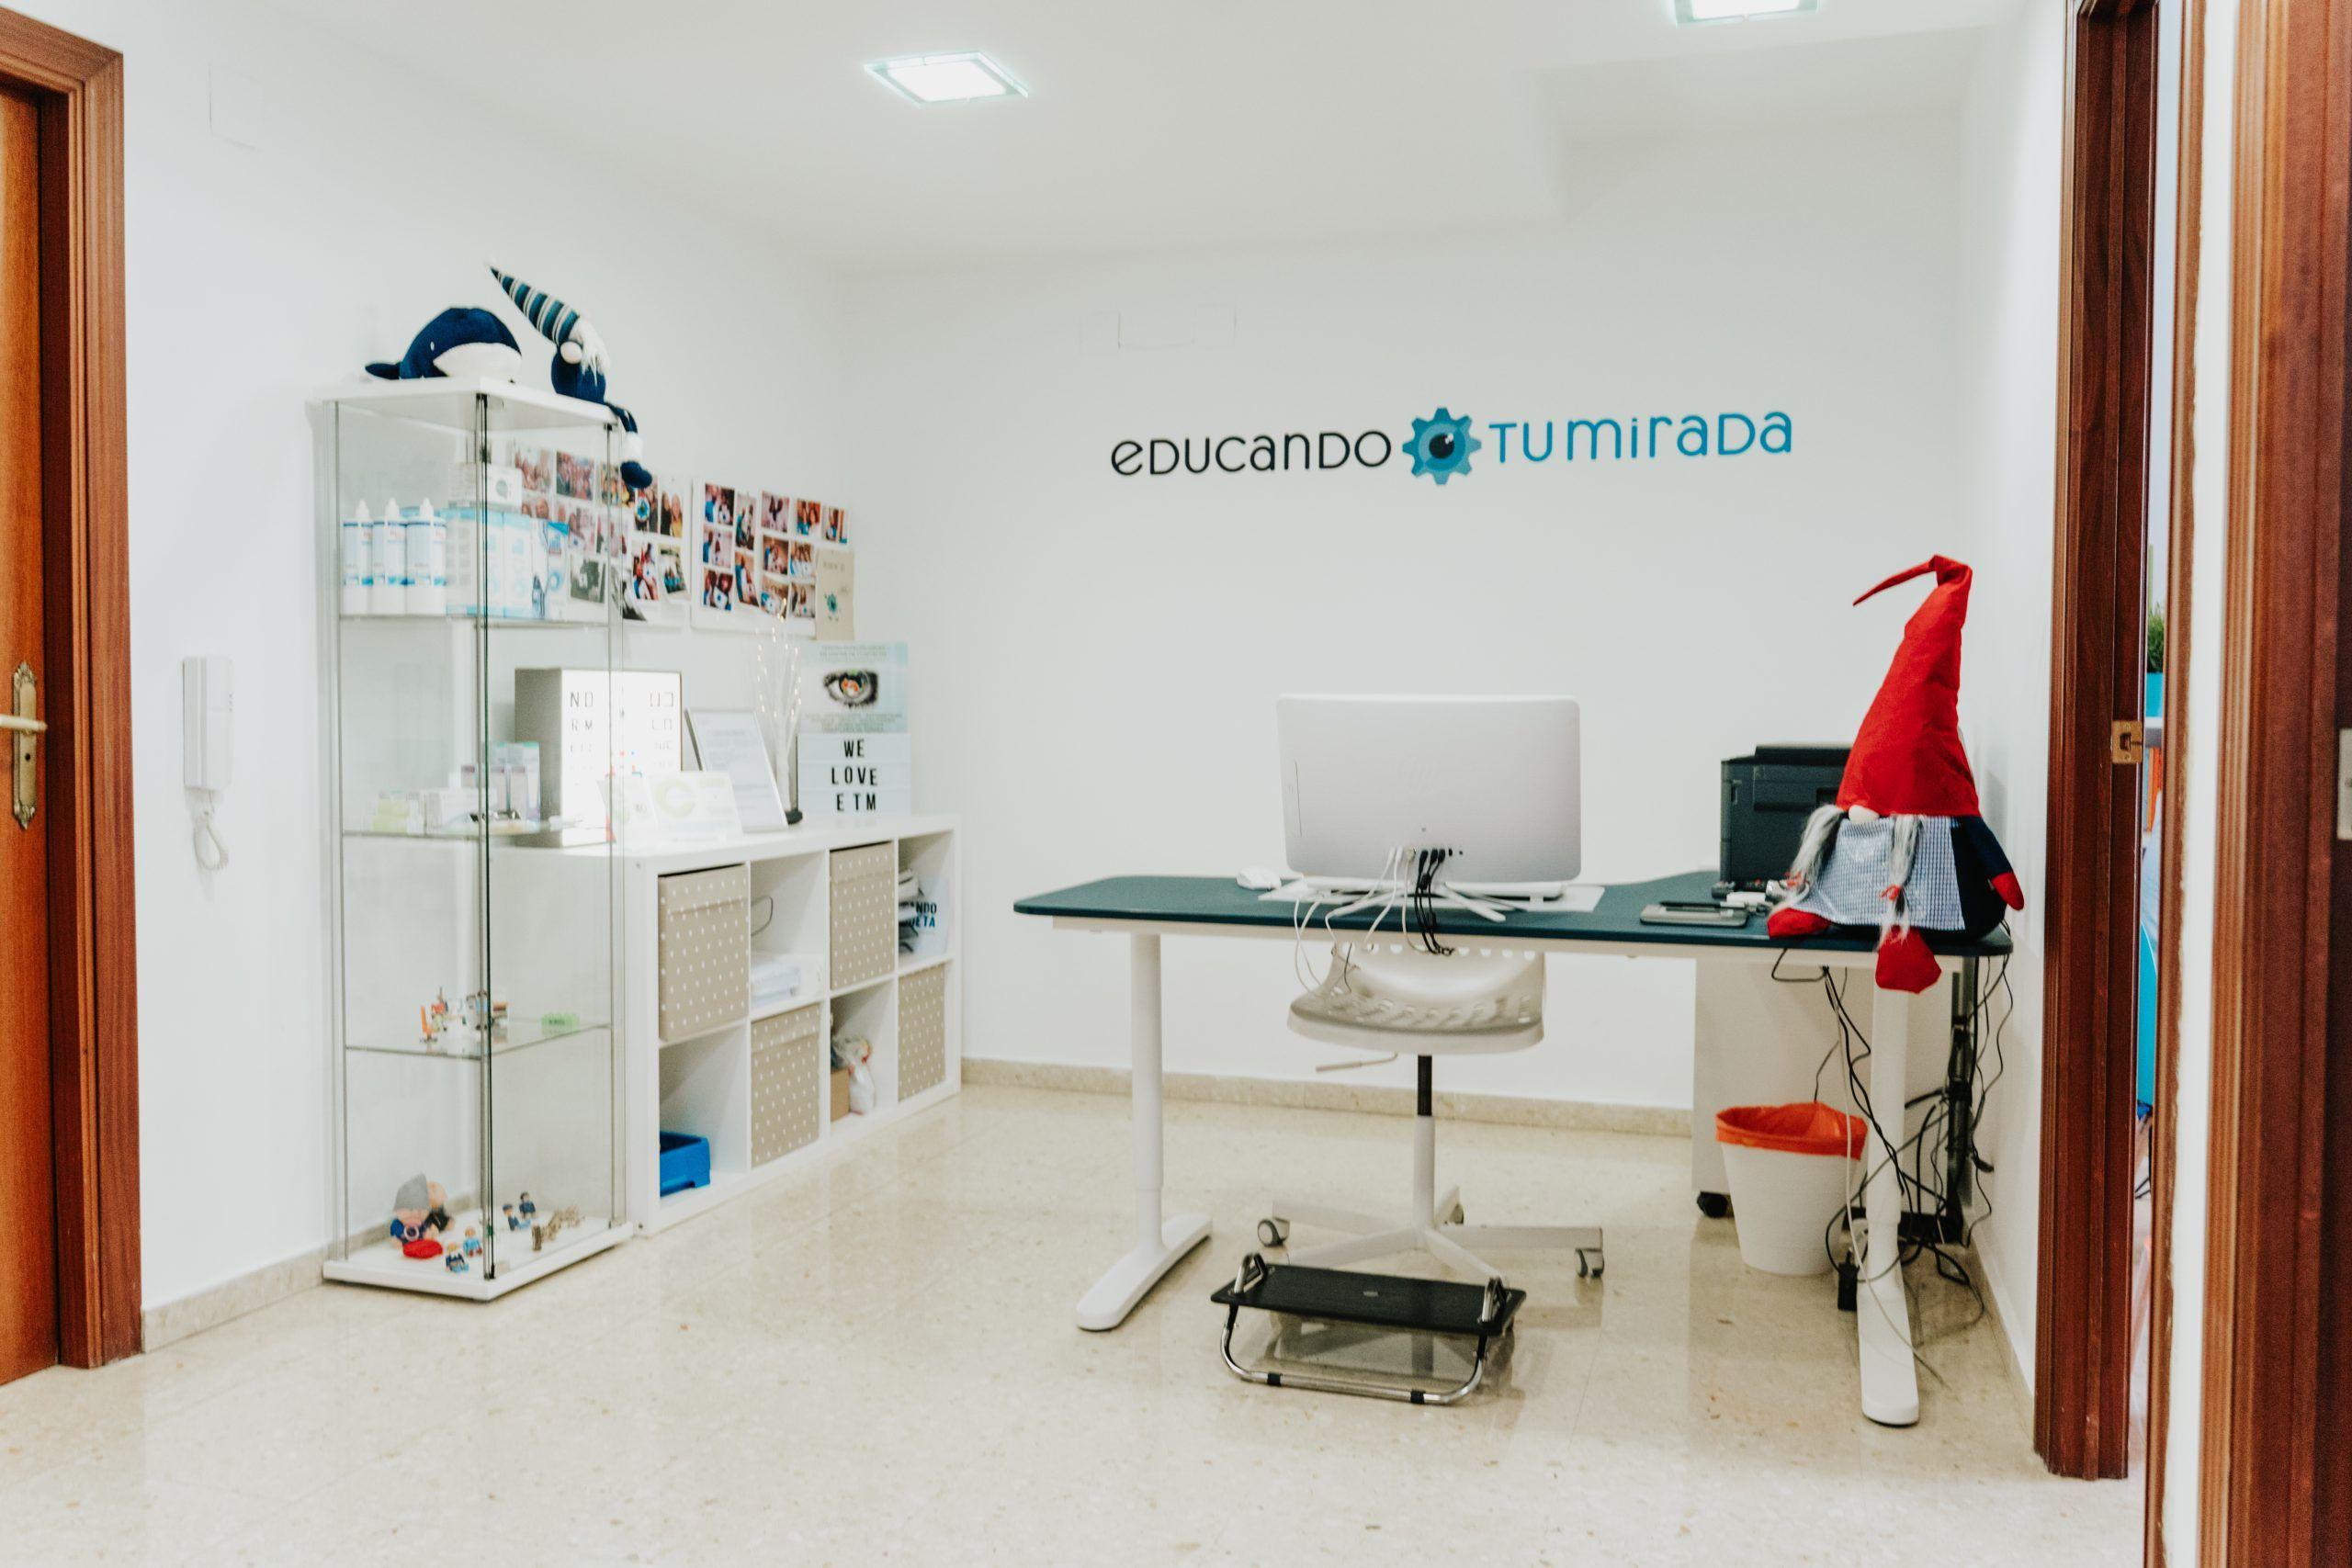 Educando tu mirada | Terapia visual | Valencia